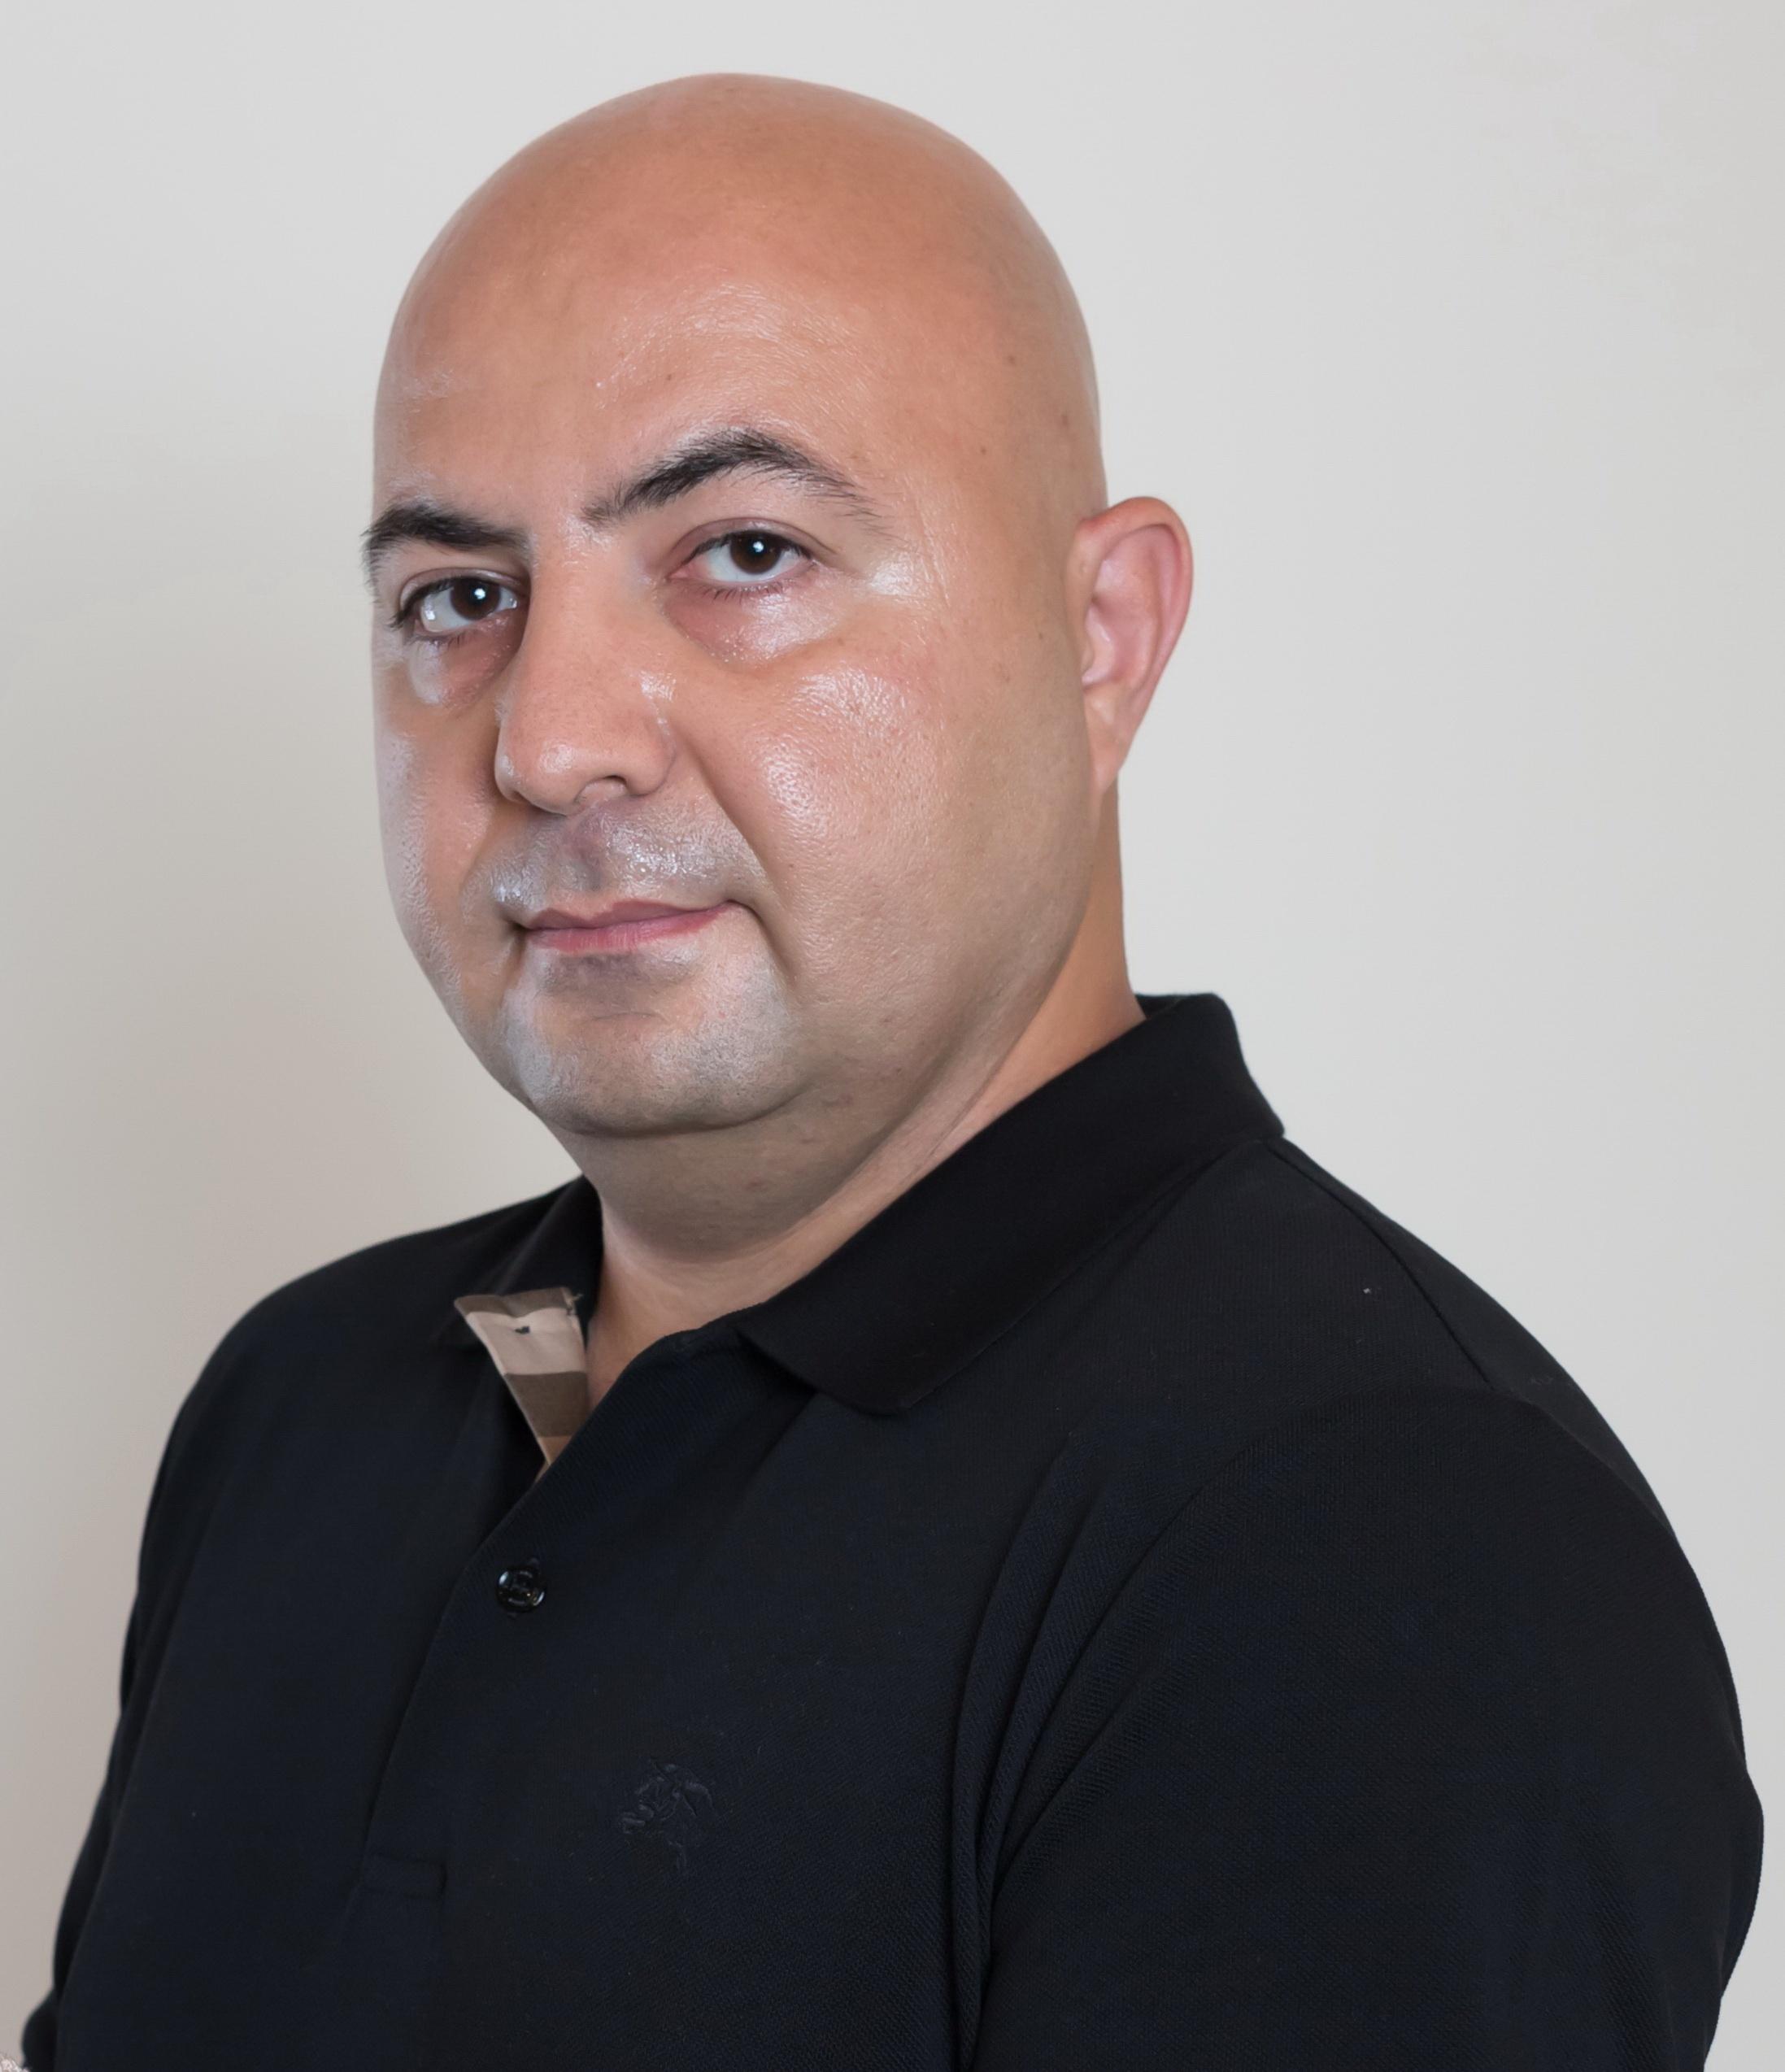 Sam Meenasian